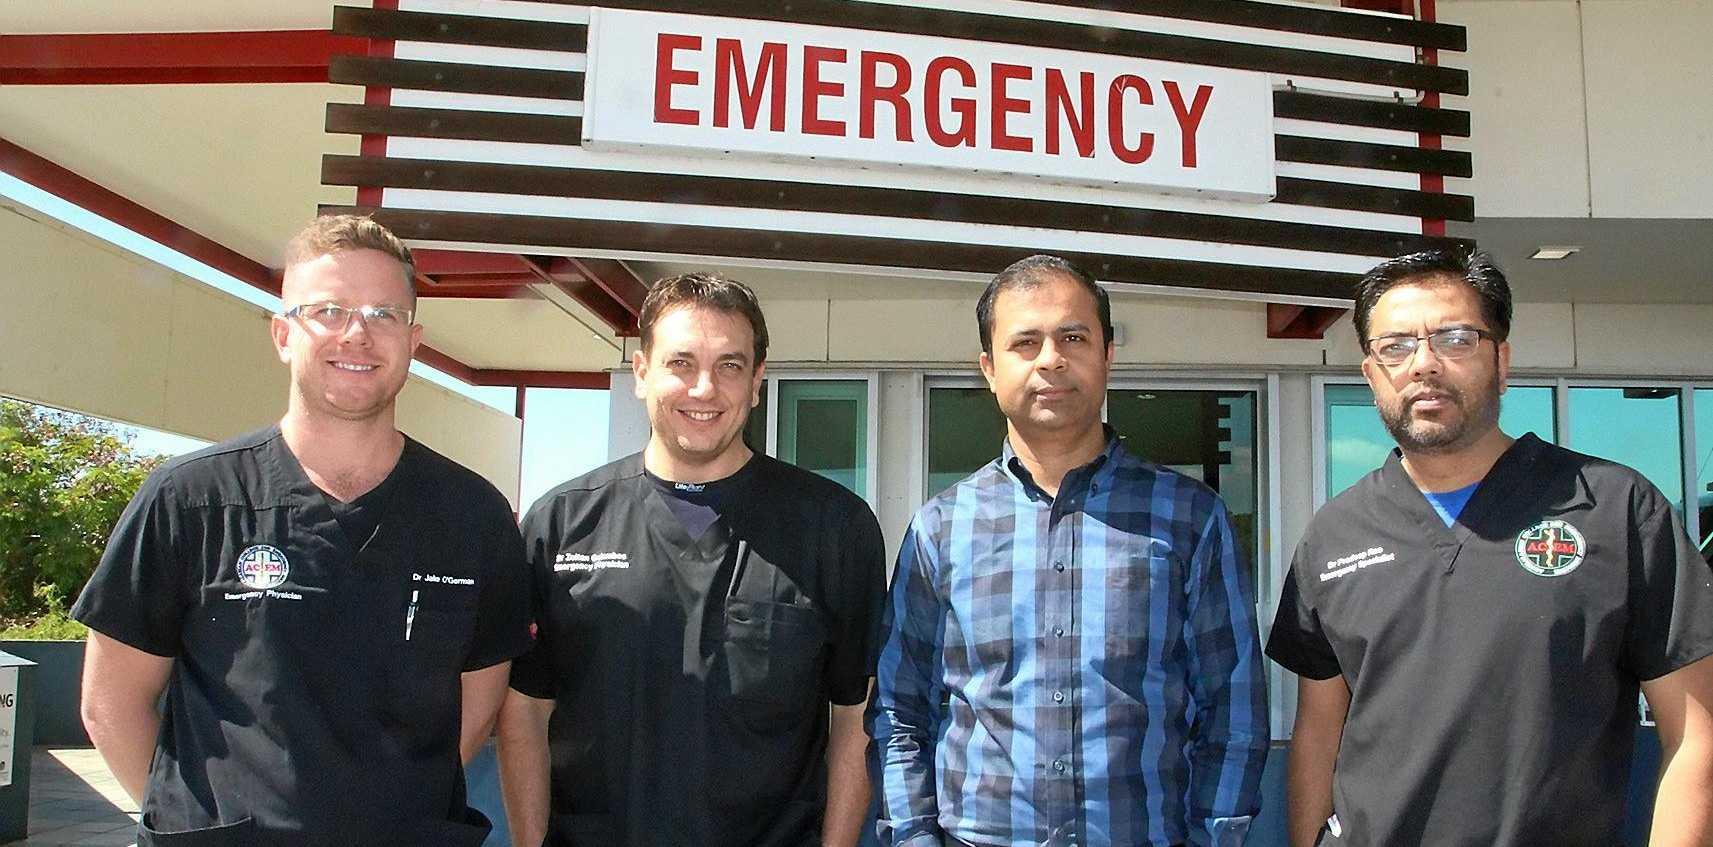 NEW TEAM: Dr. Jacob O'Gorman, Dr Zoltan Galambos, Dr Dilip Kumar and Dr Pradeep Rao